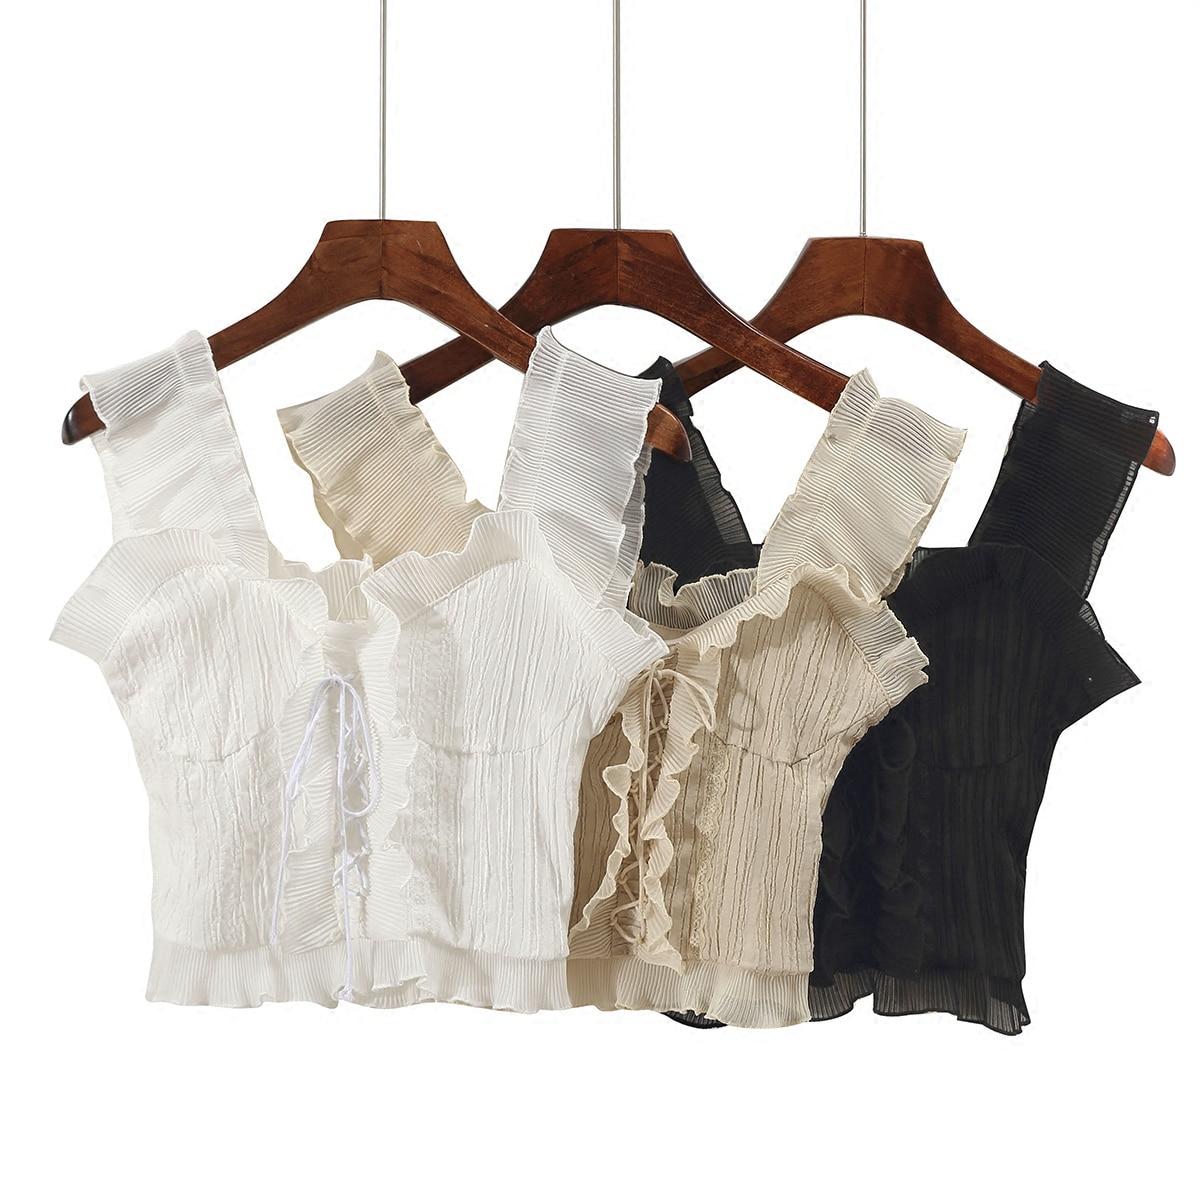 Retro Chiffon Ruffles Camis thin High waist Chiffon Vest sweet short Sleeveless Shirts Lace Up straps Pleated   Tank     Tops   2018